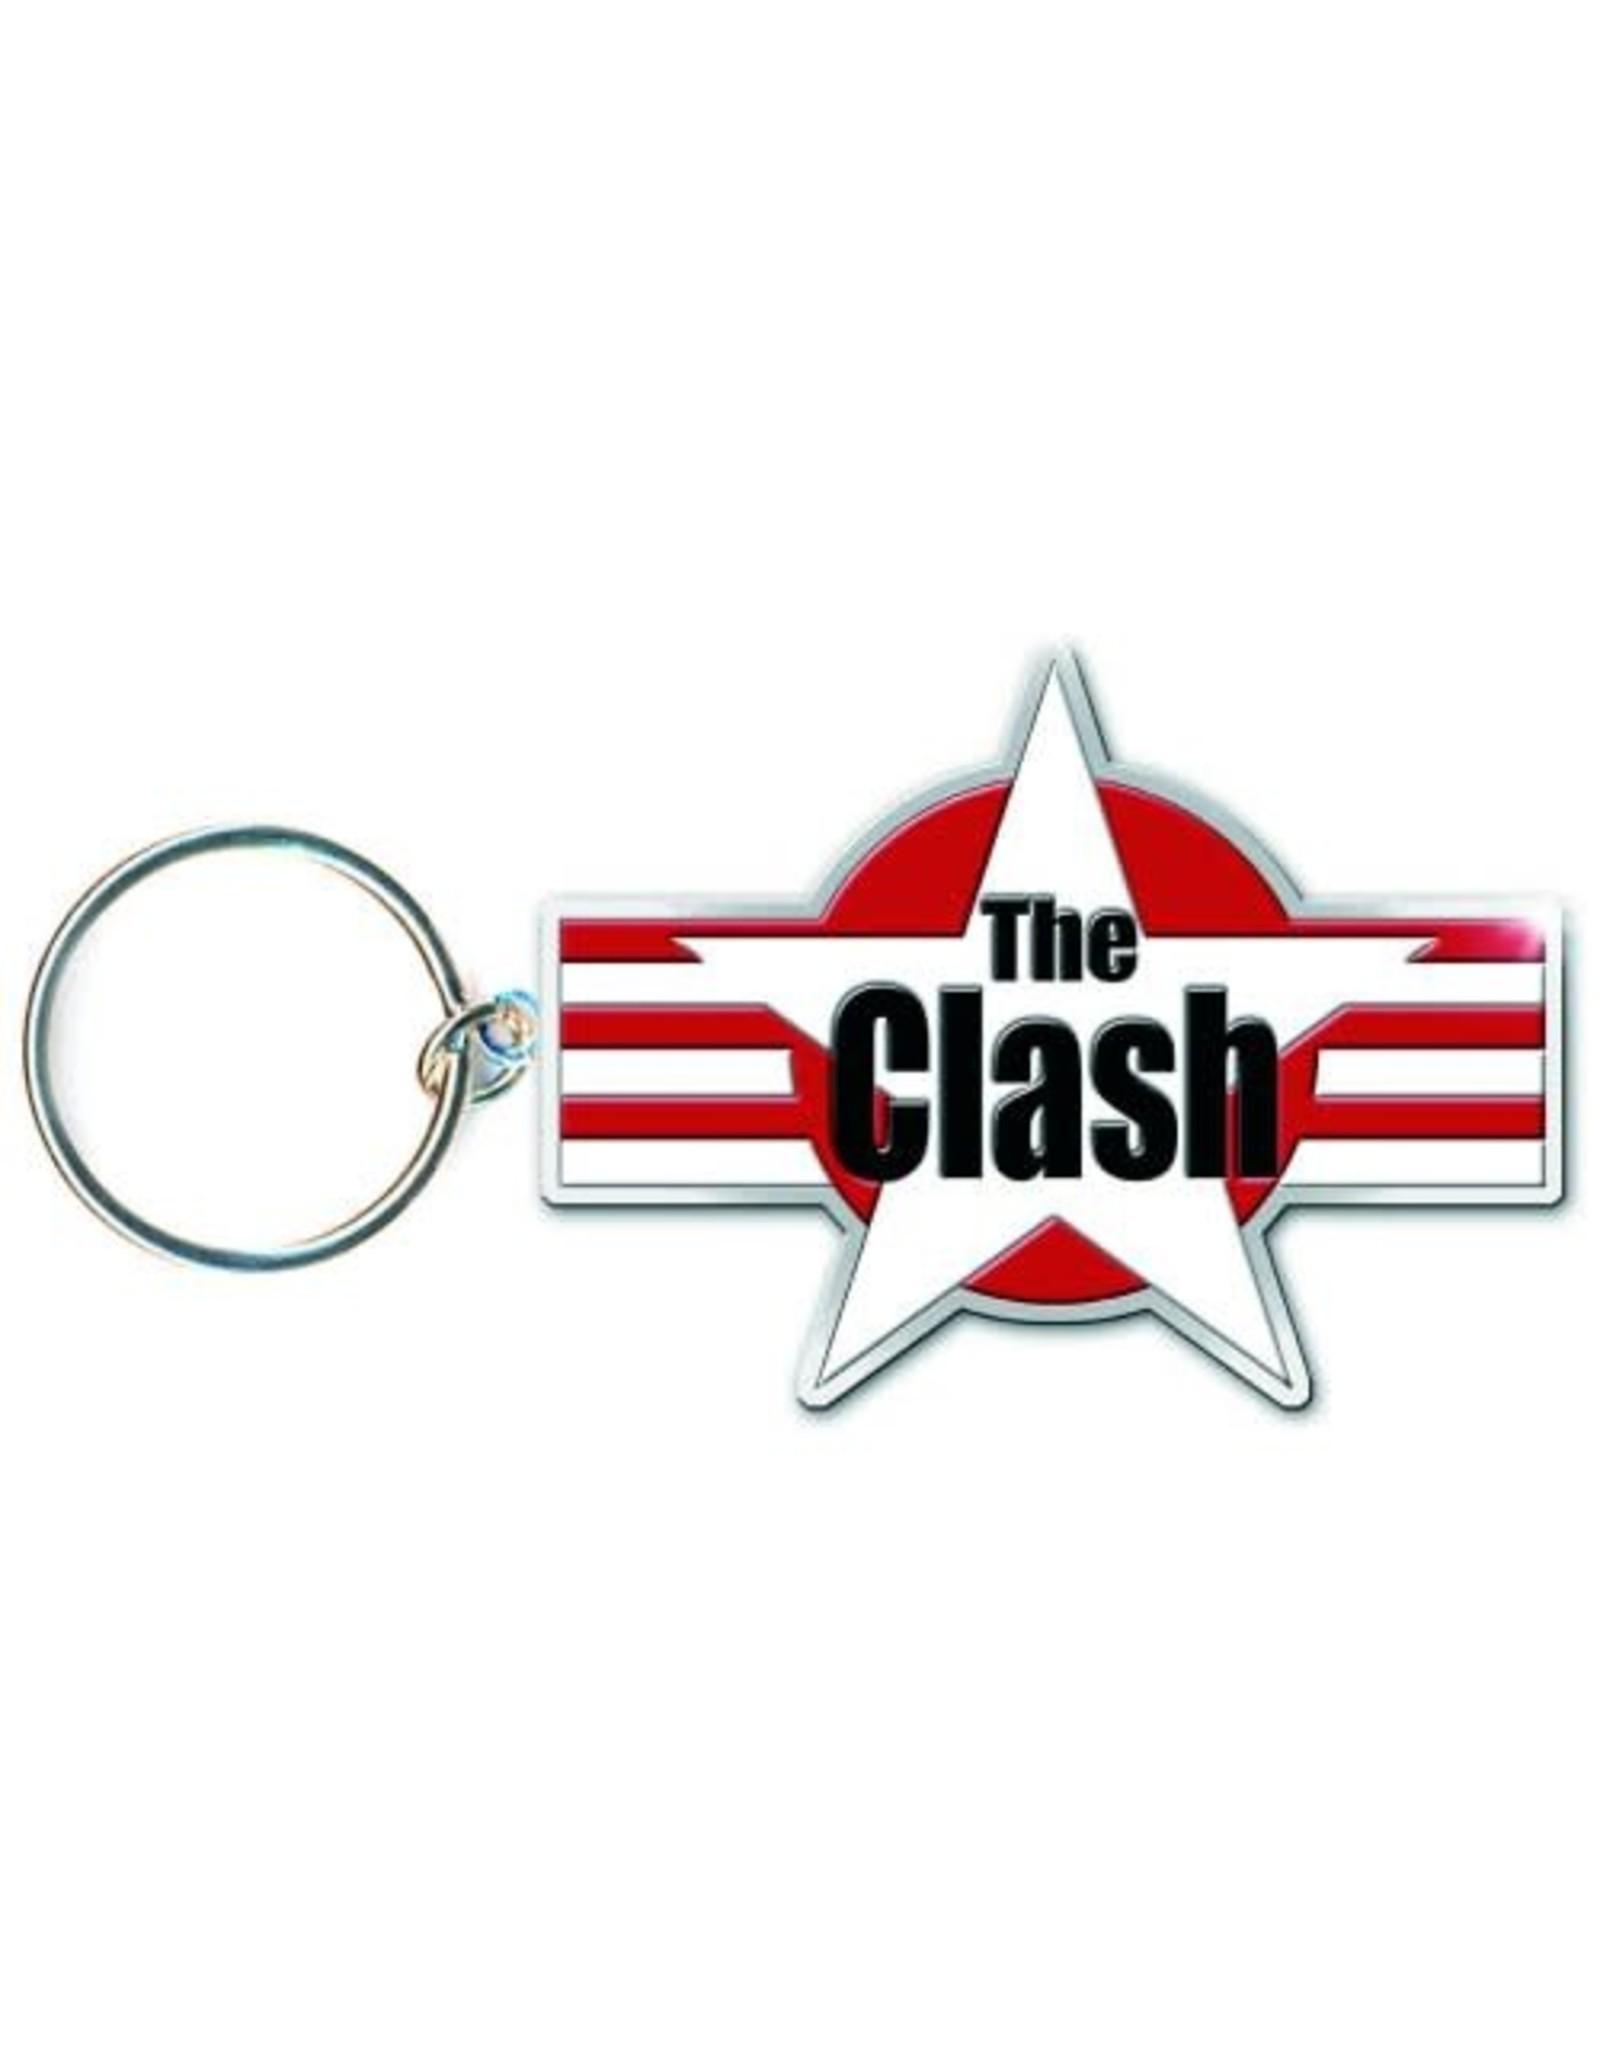 The Clash / Stars & Stripes Logo Keychain